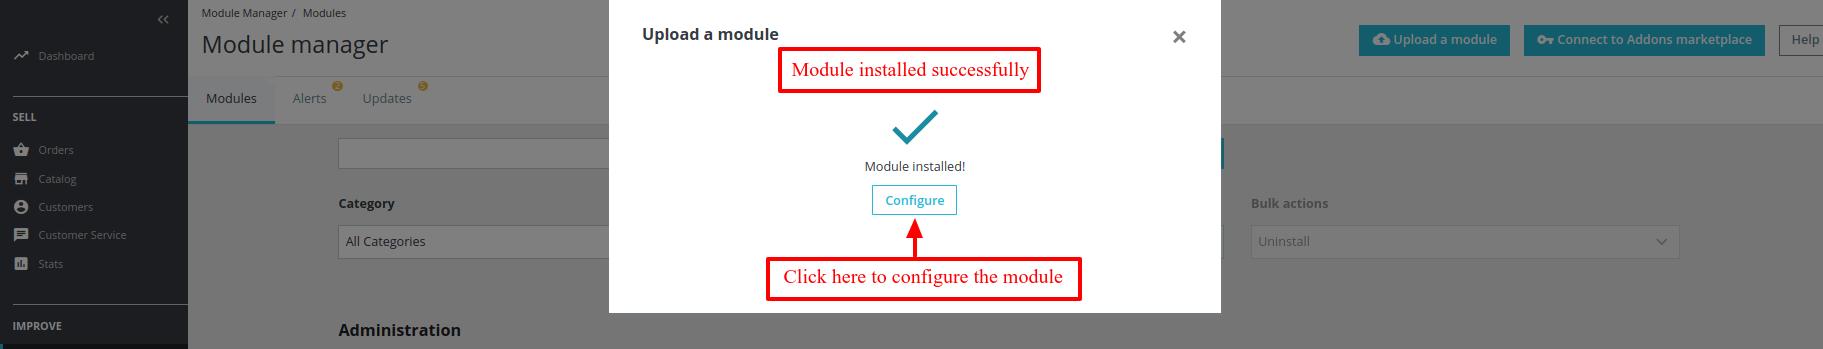 Module installed